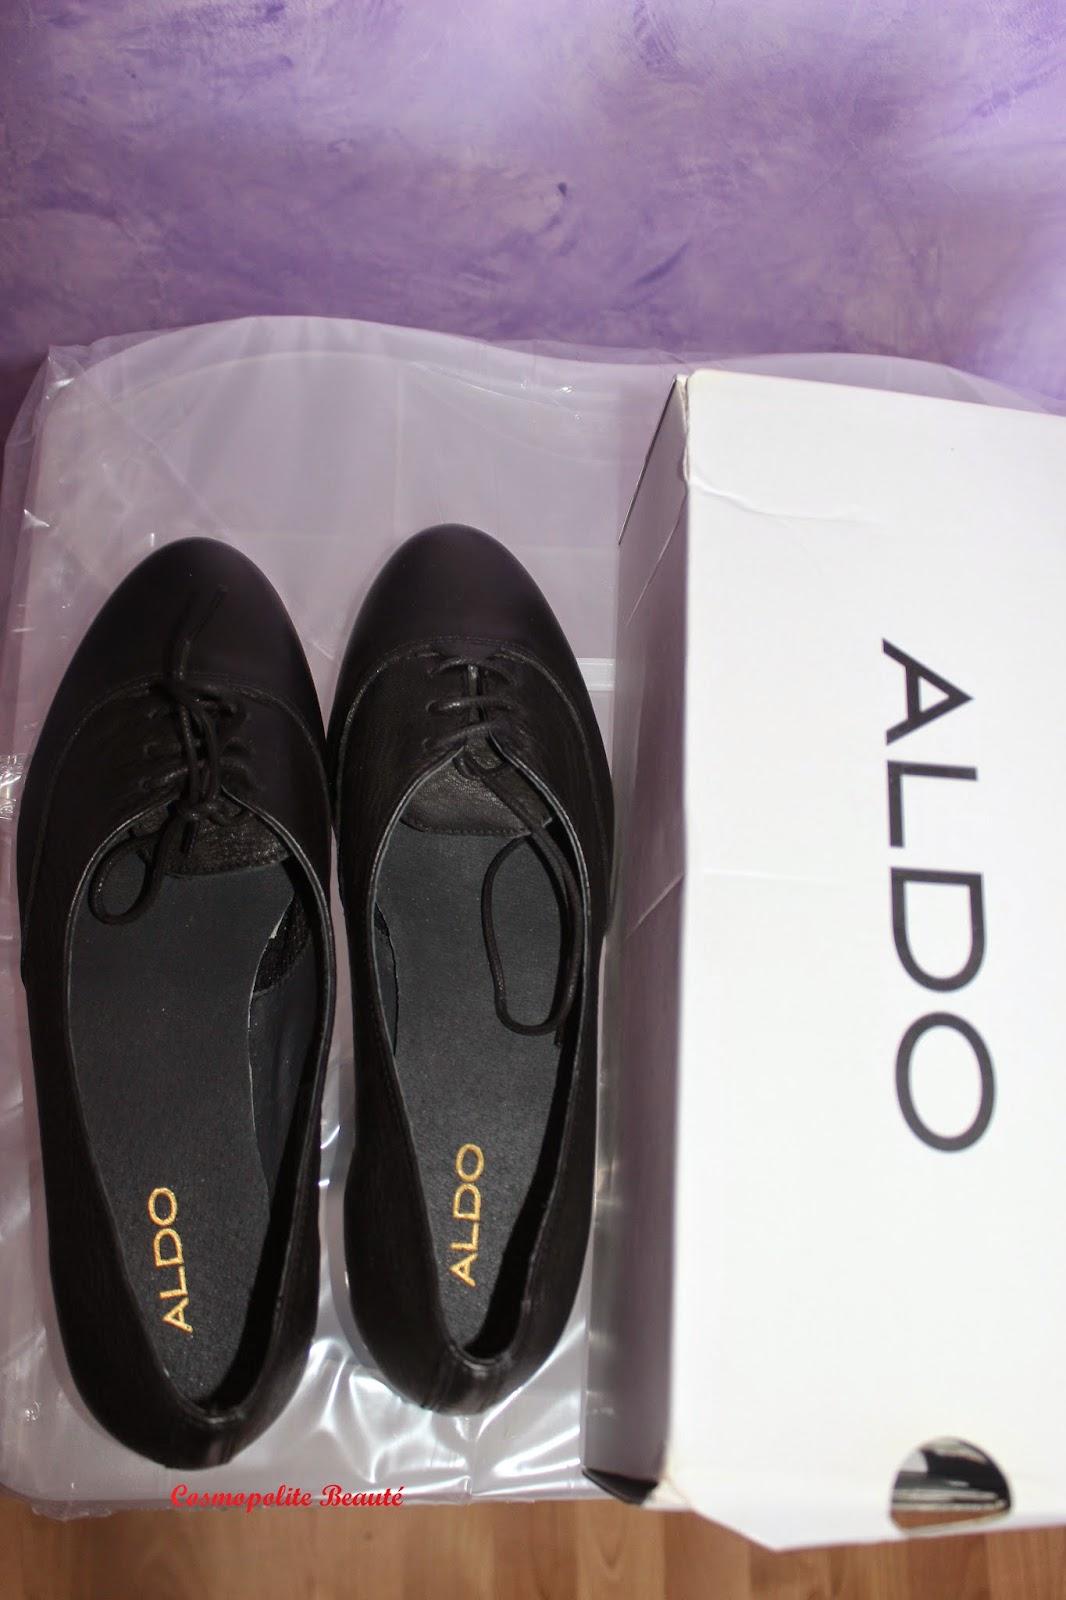 Voyage, Barcelone, trip, Barcelona, derby, femme, chaussures, Aldo